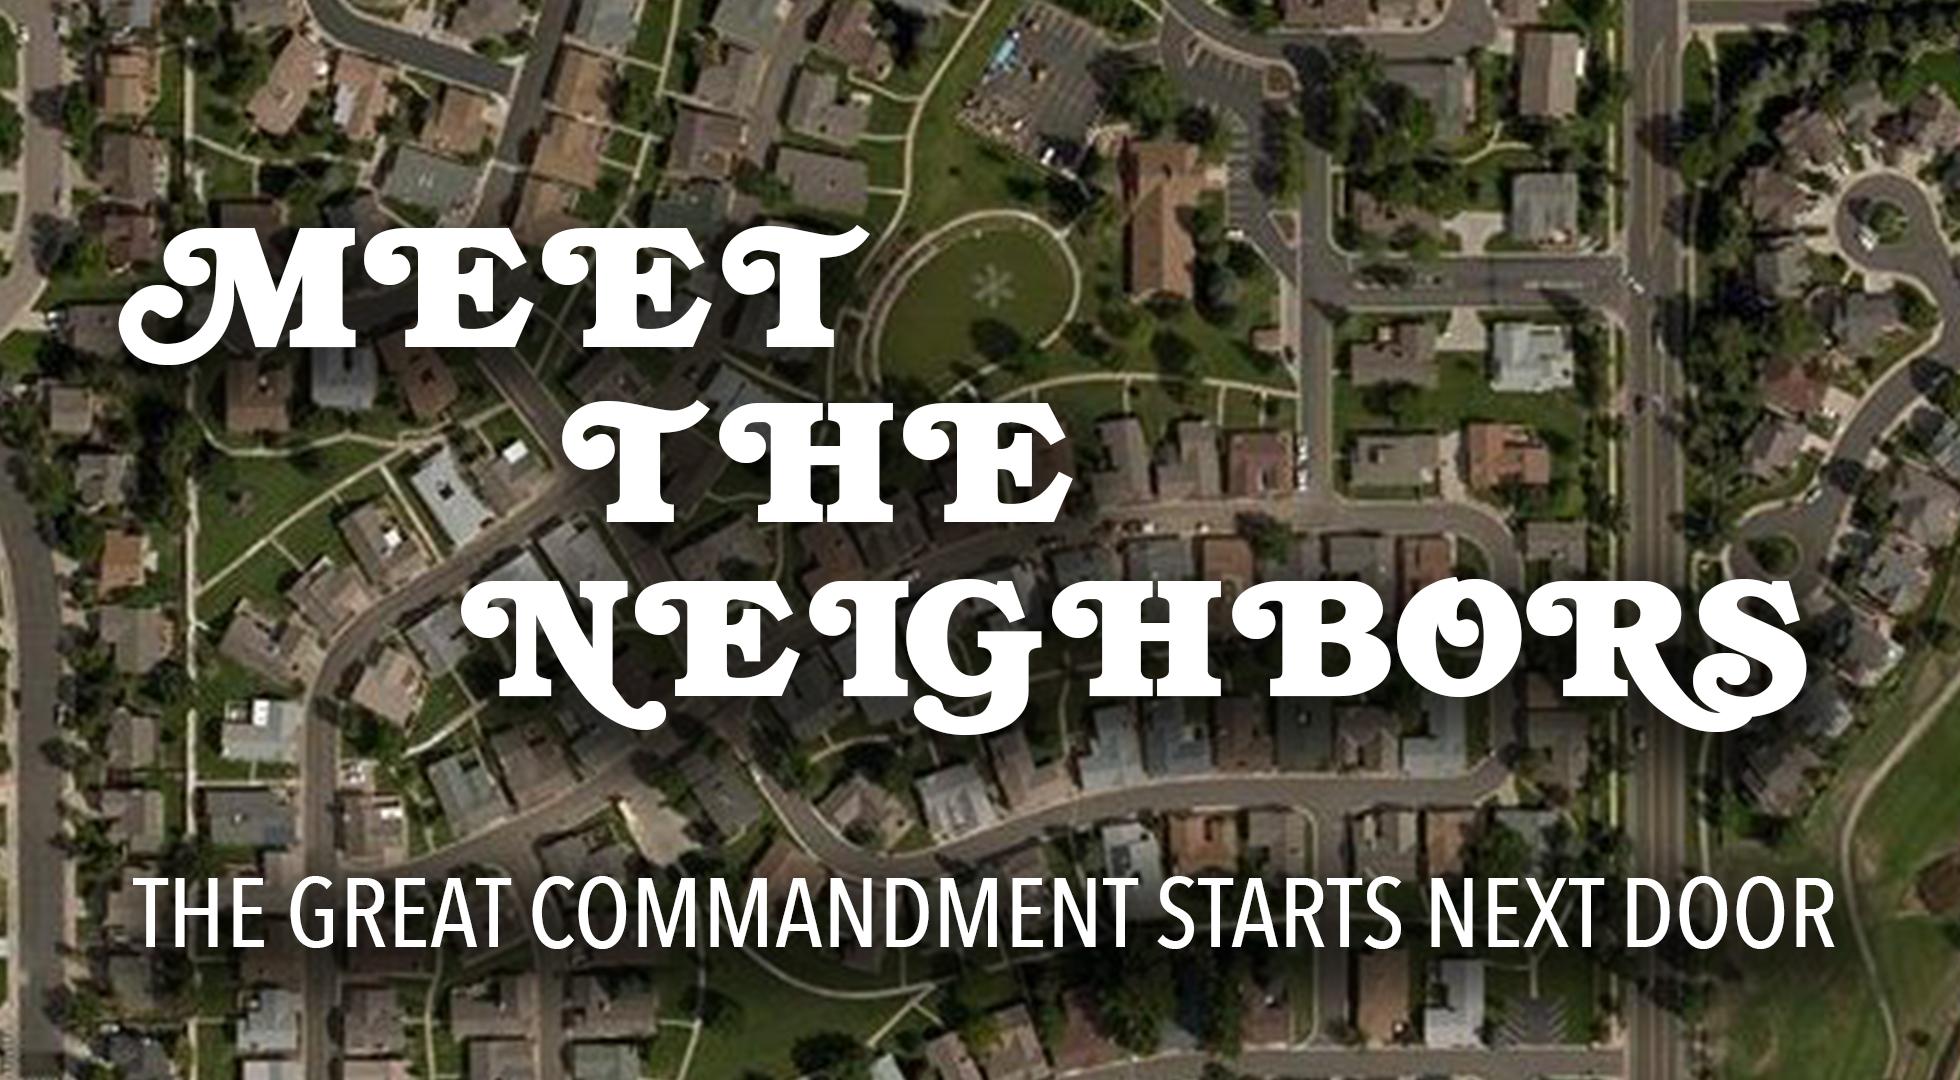 meet_the_neighbors.jpg